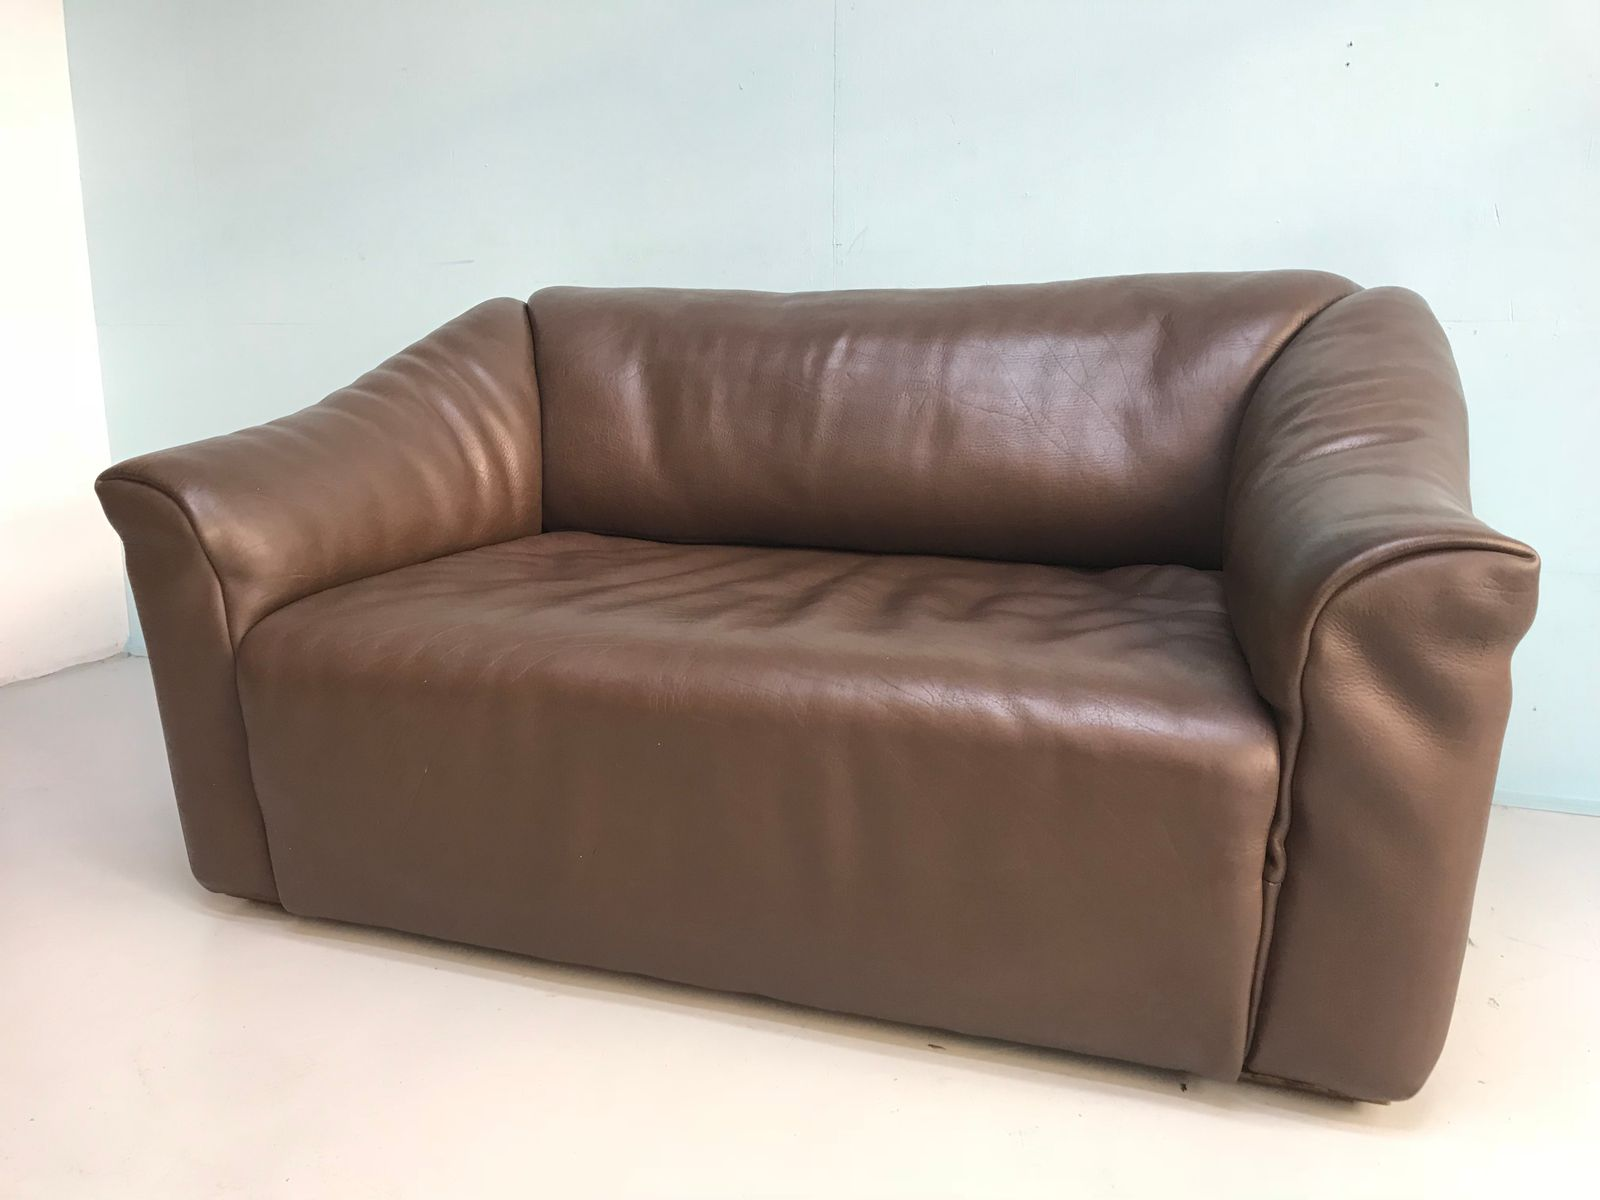 braunes ds 47 vintage sofa von de sede 1970er bei pamono. Black Bedroom Furniture Sets. Home Design Ideas